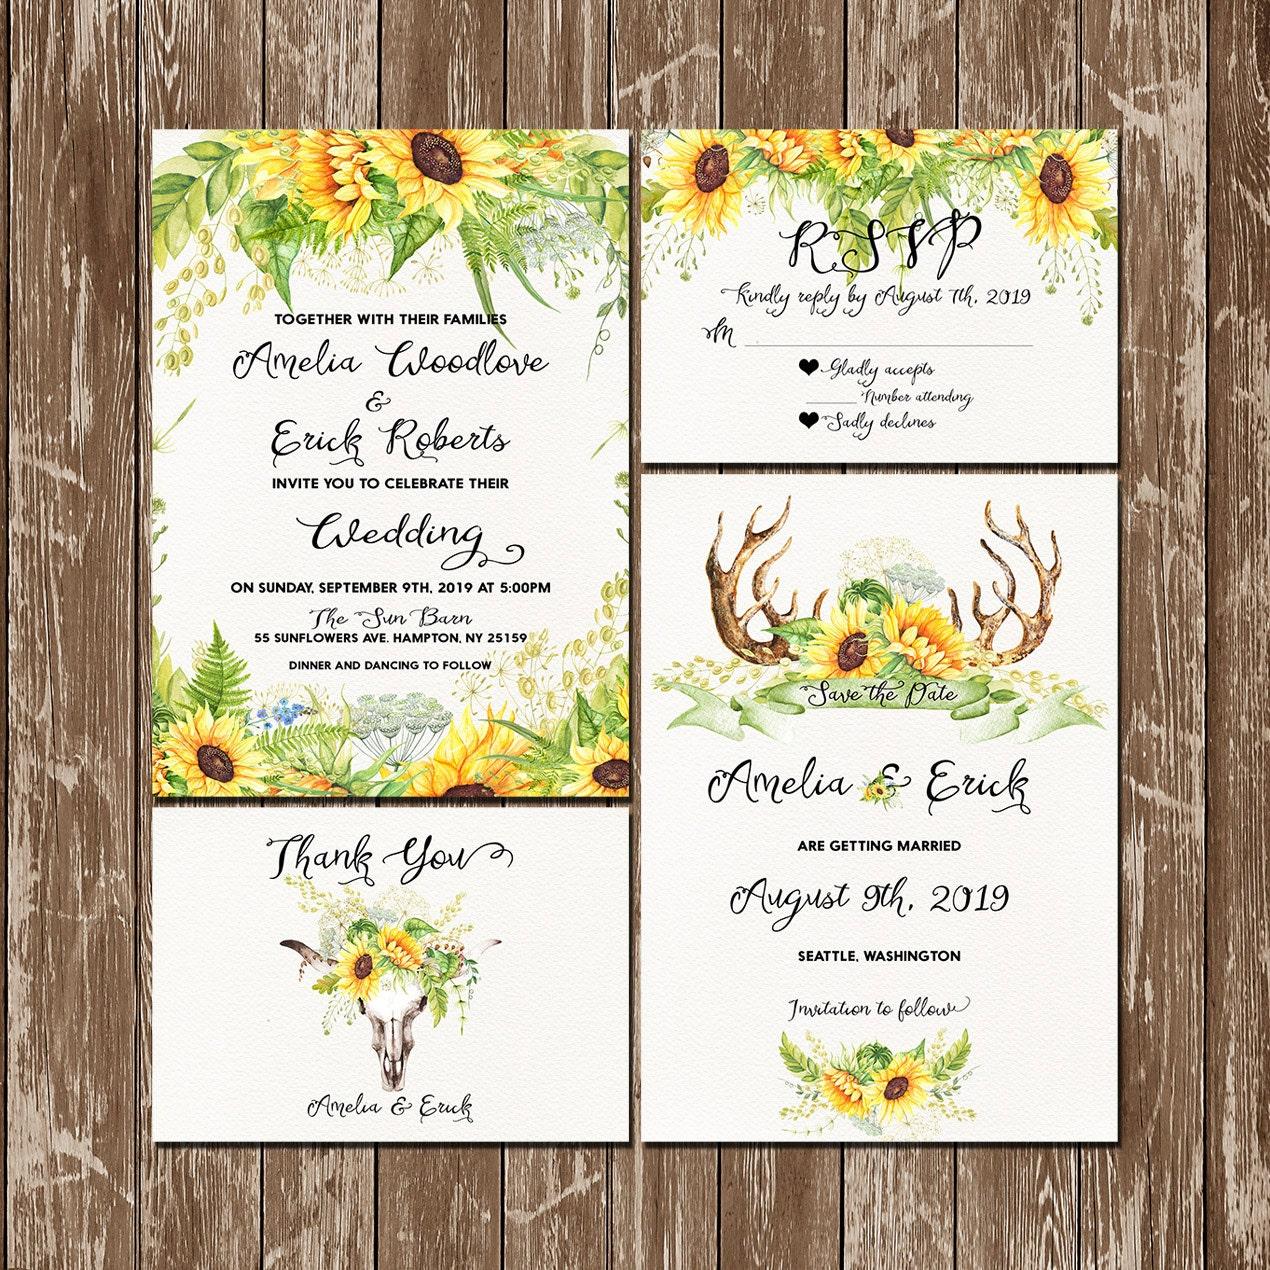 Sunflower and wild herbs Wedding Invitation Set Rustic